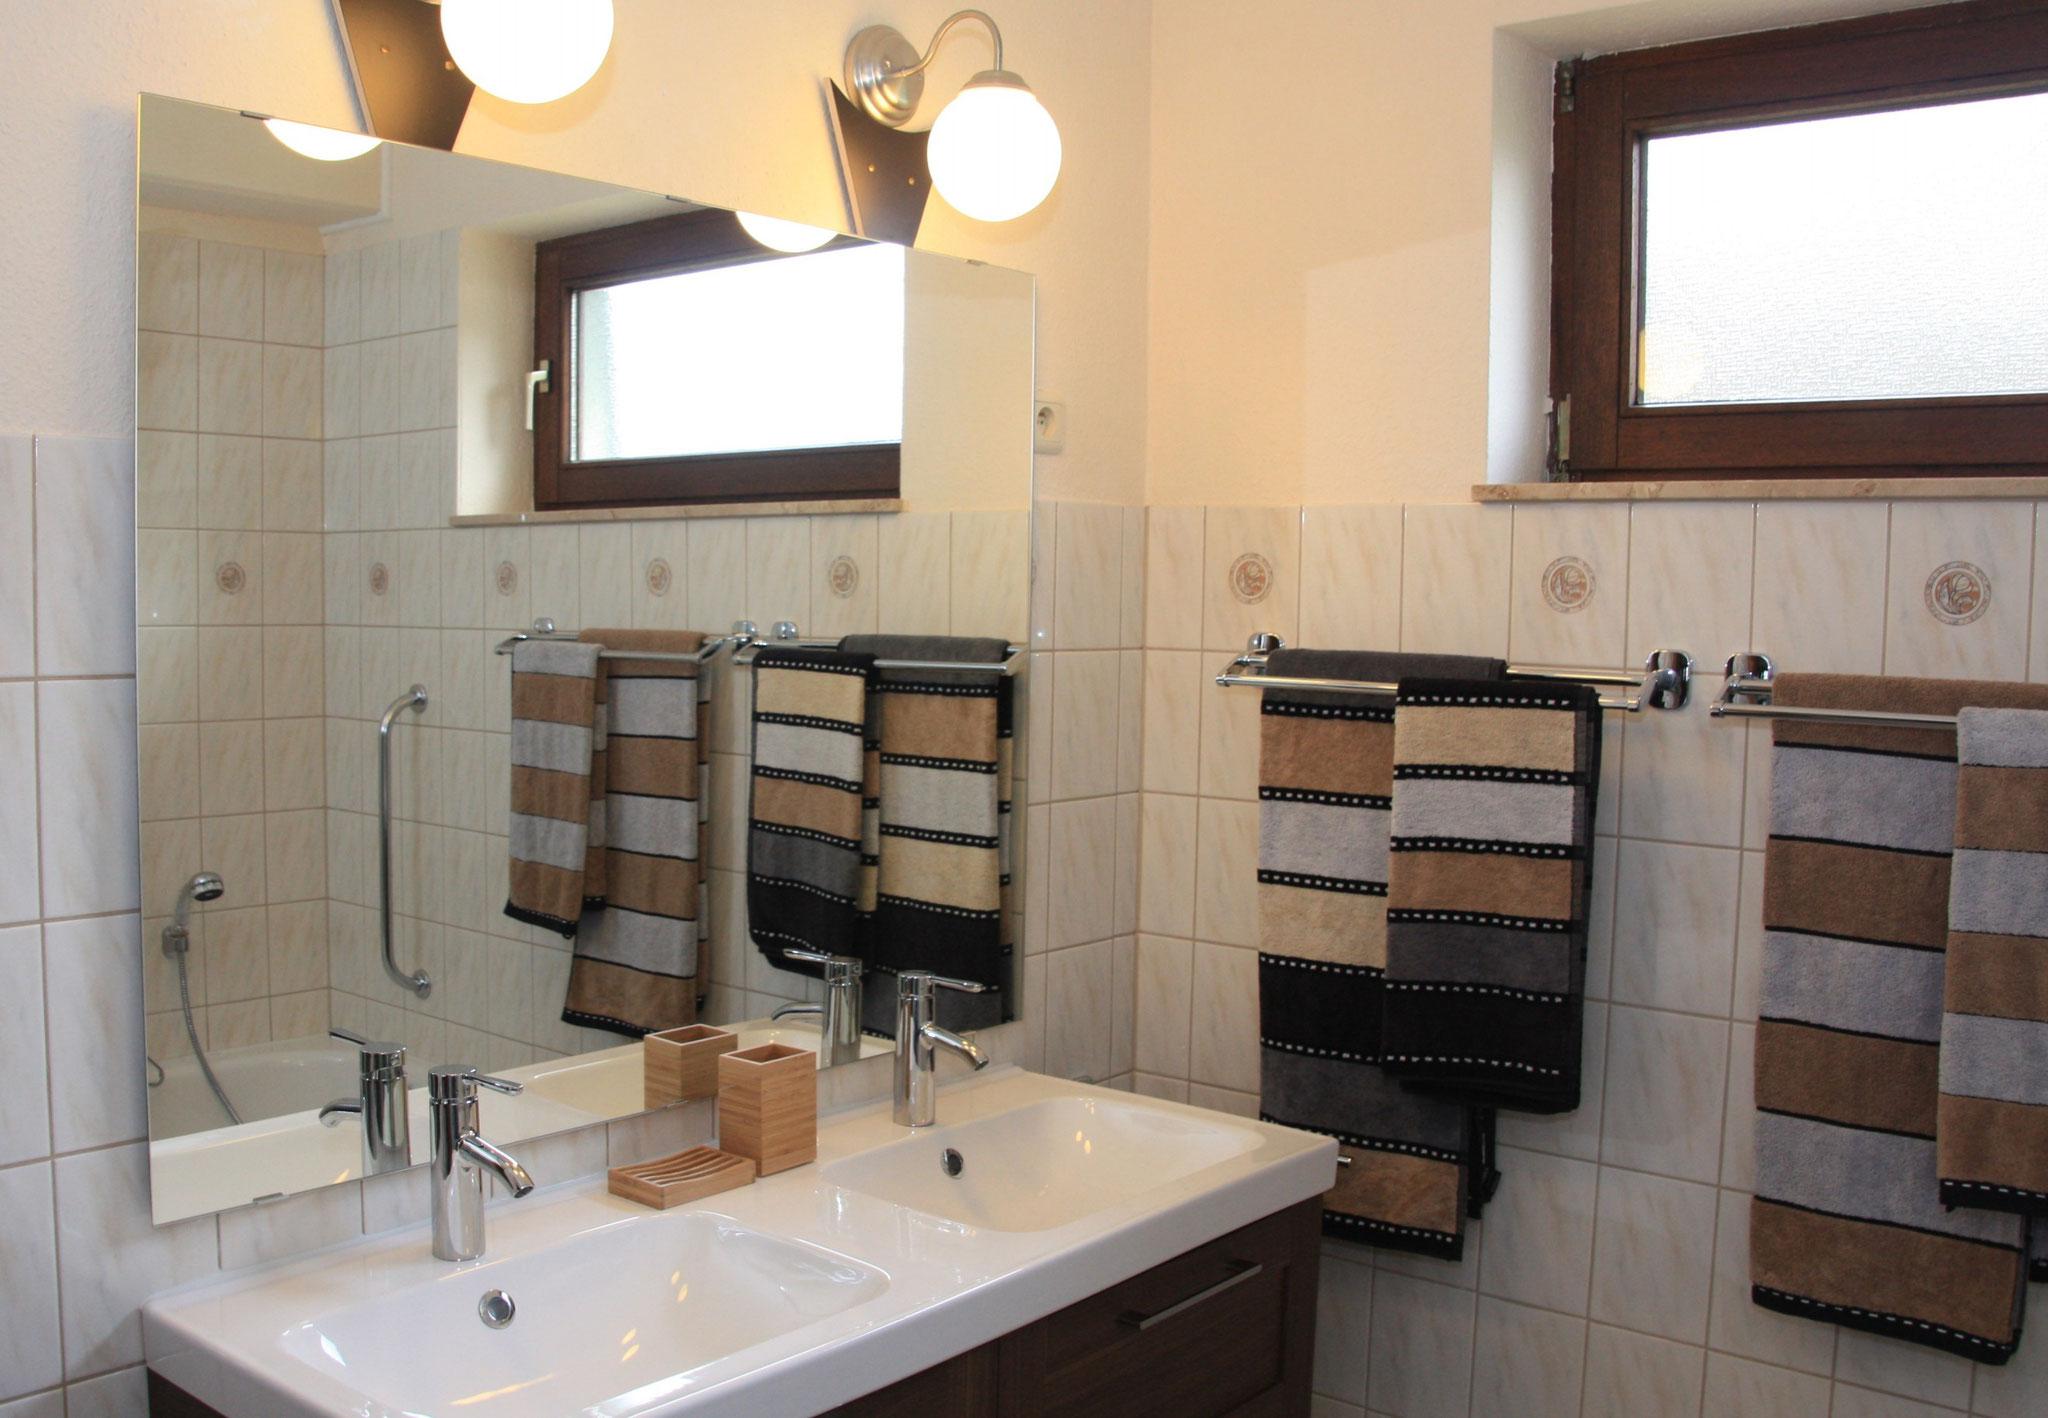 Das frisch renovierte Bad mit Doppelwaschbecken.   |   De net gerenoveerde badkamer met moderne dubbele wastafel